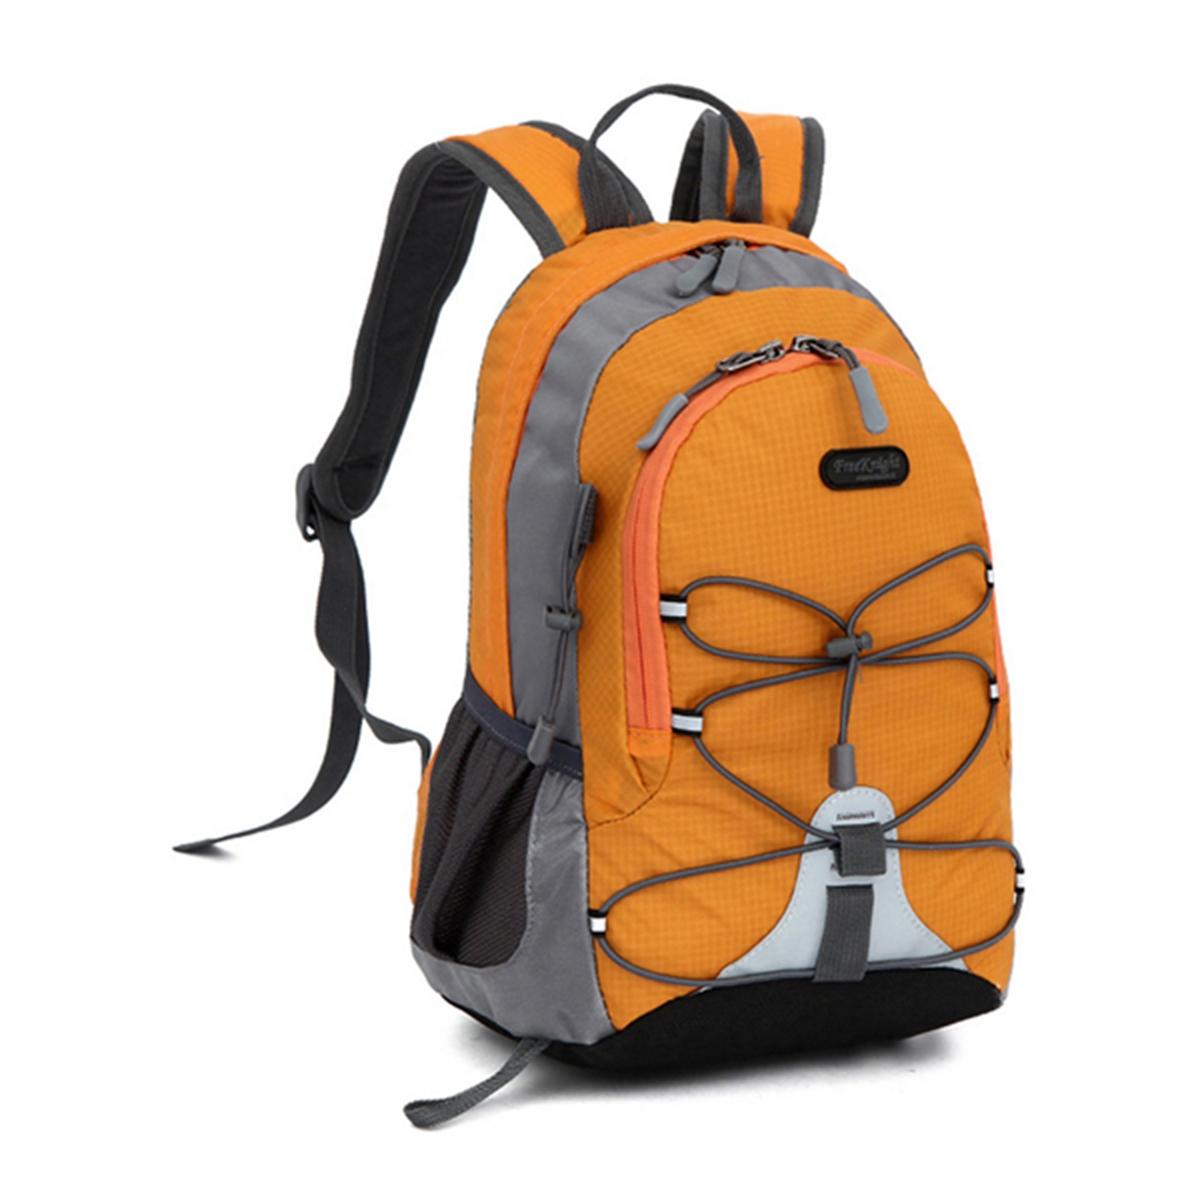 children waterproof bookbag travel rucksack school bag orange lazada indonesia. Black Bedroom Furniture Sets. Home Design Ideas